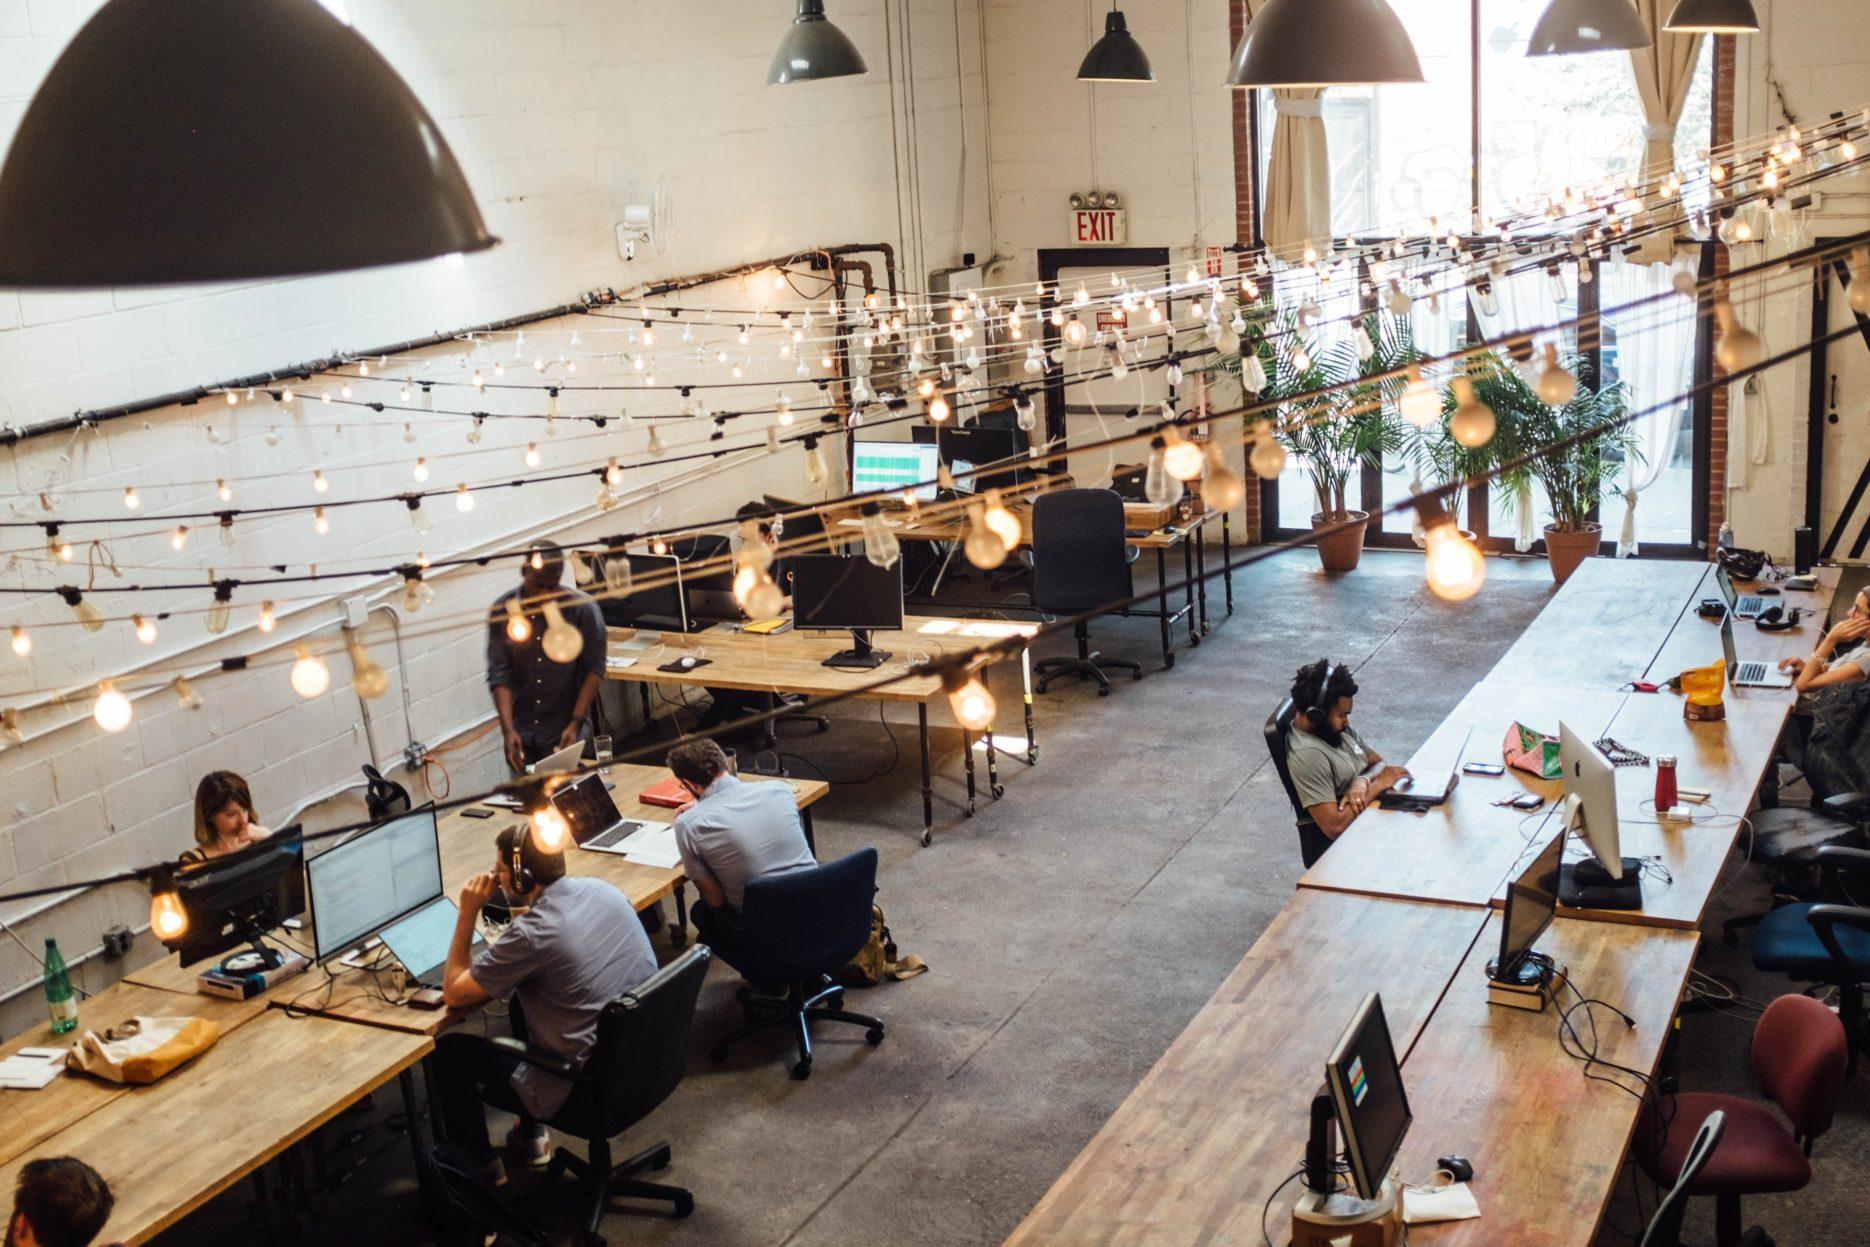 Urban working environment